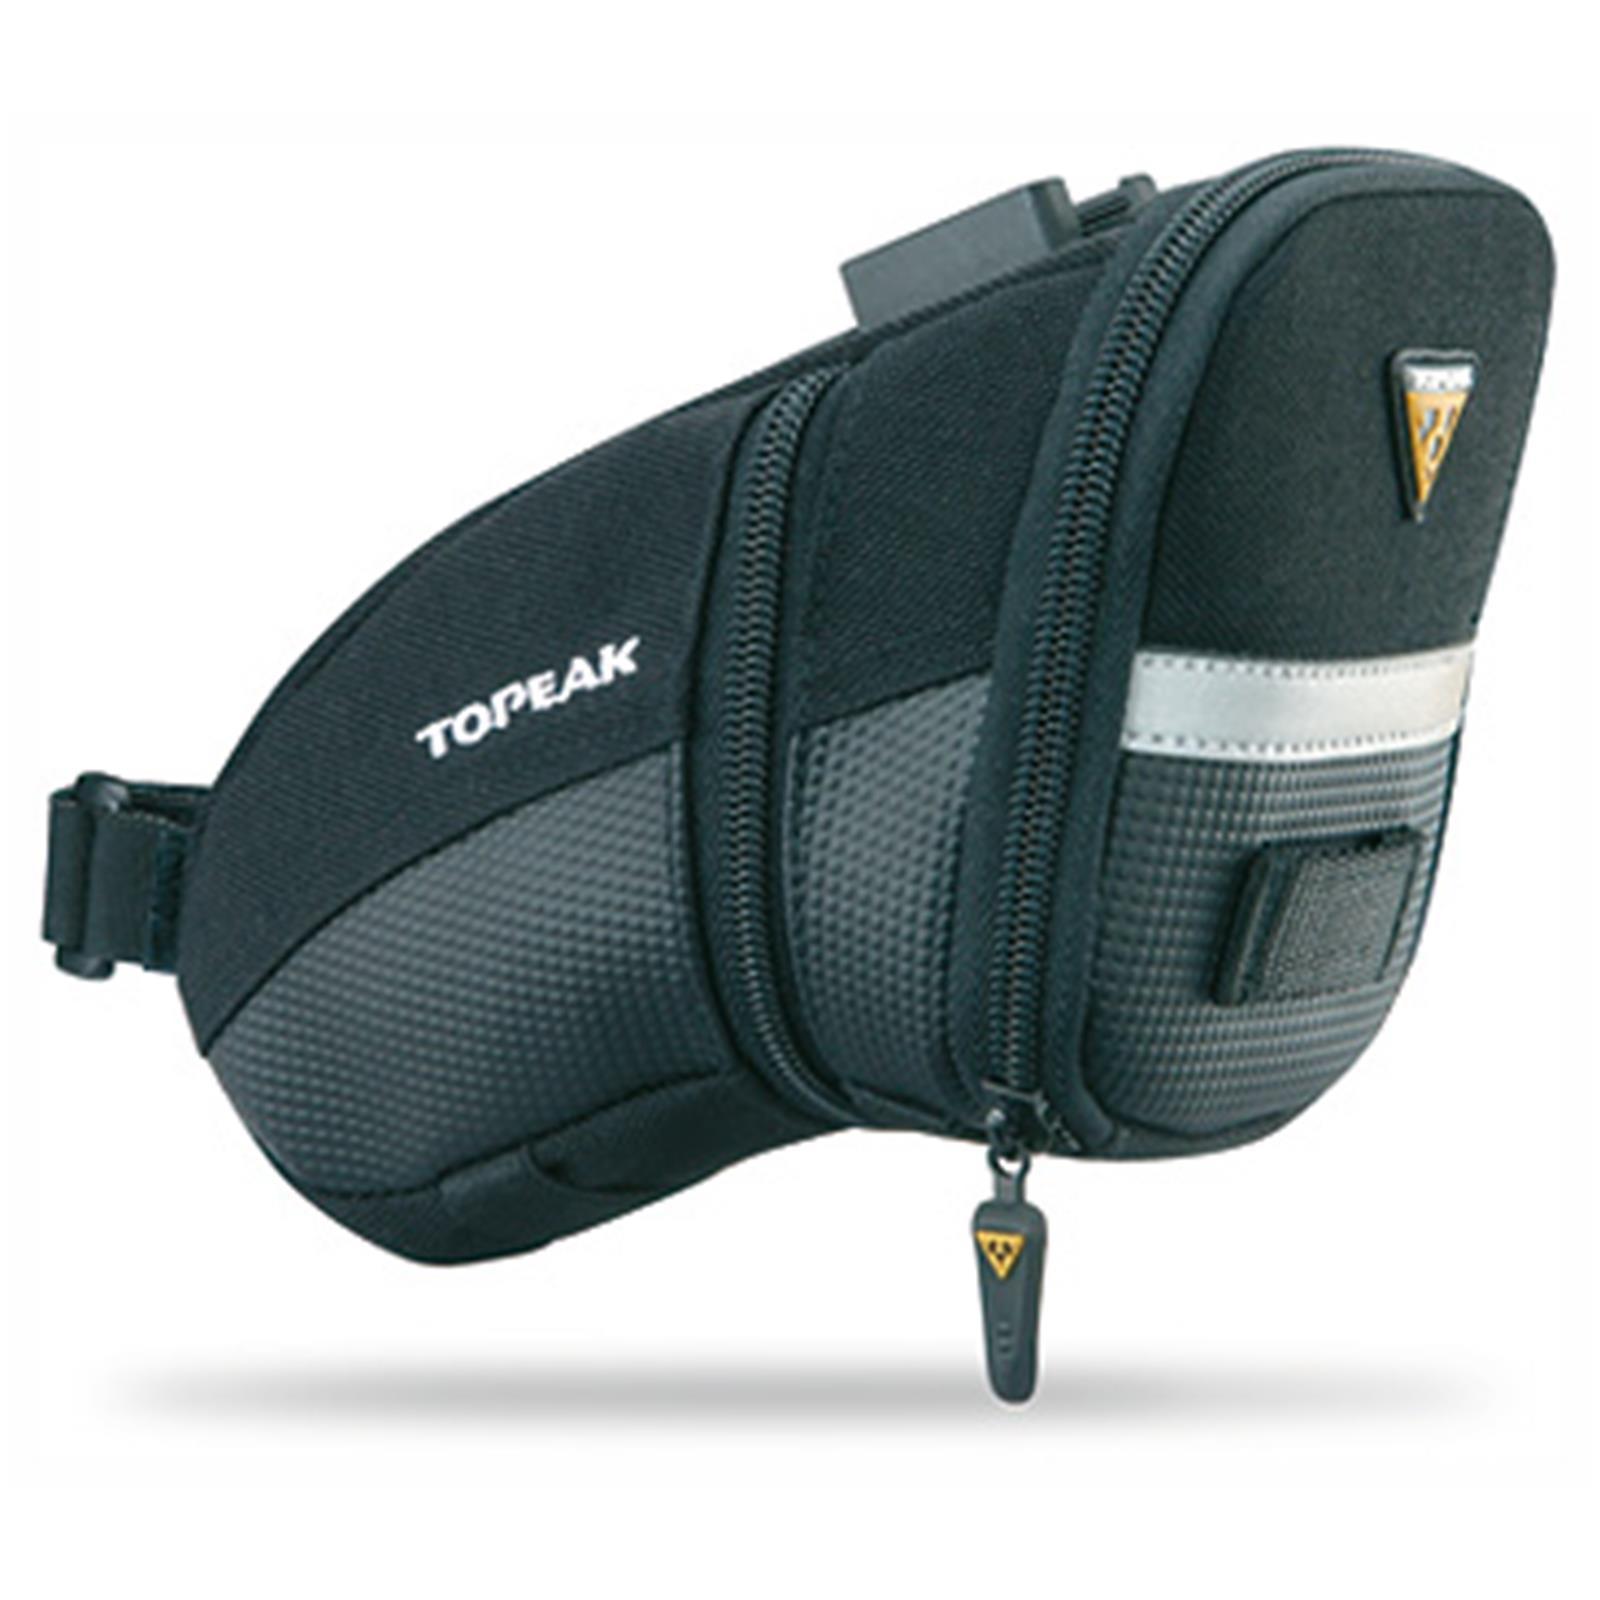 topeak aero wedge pack satteltasche alle gr en halter fahrrad reifen tasche ebay. Black Bedroom Furniture Sets. Home Design Ideas